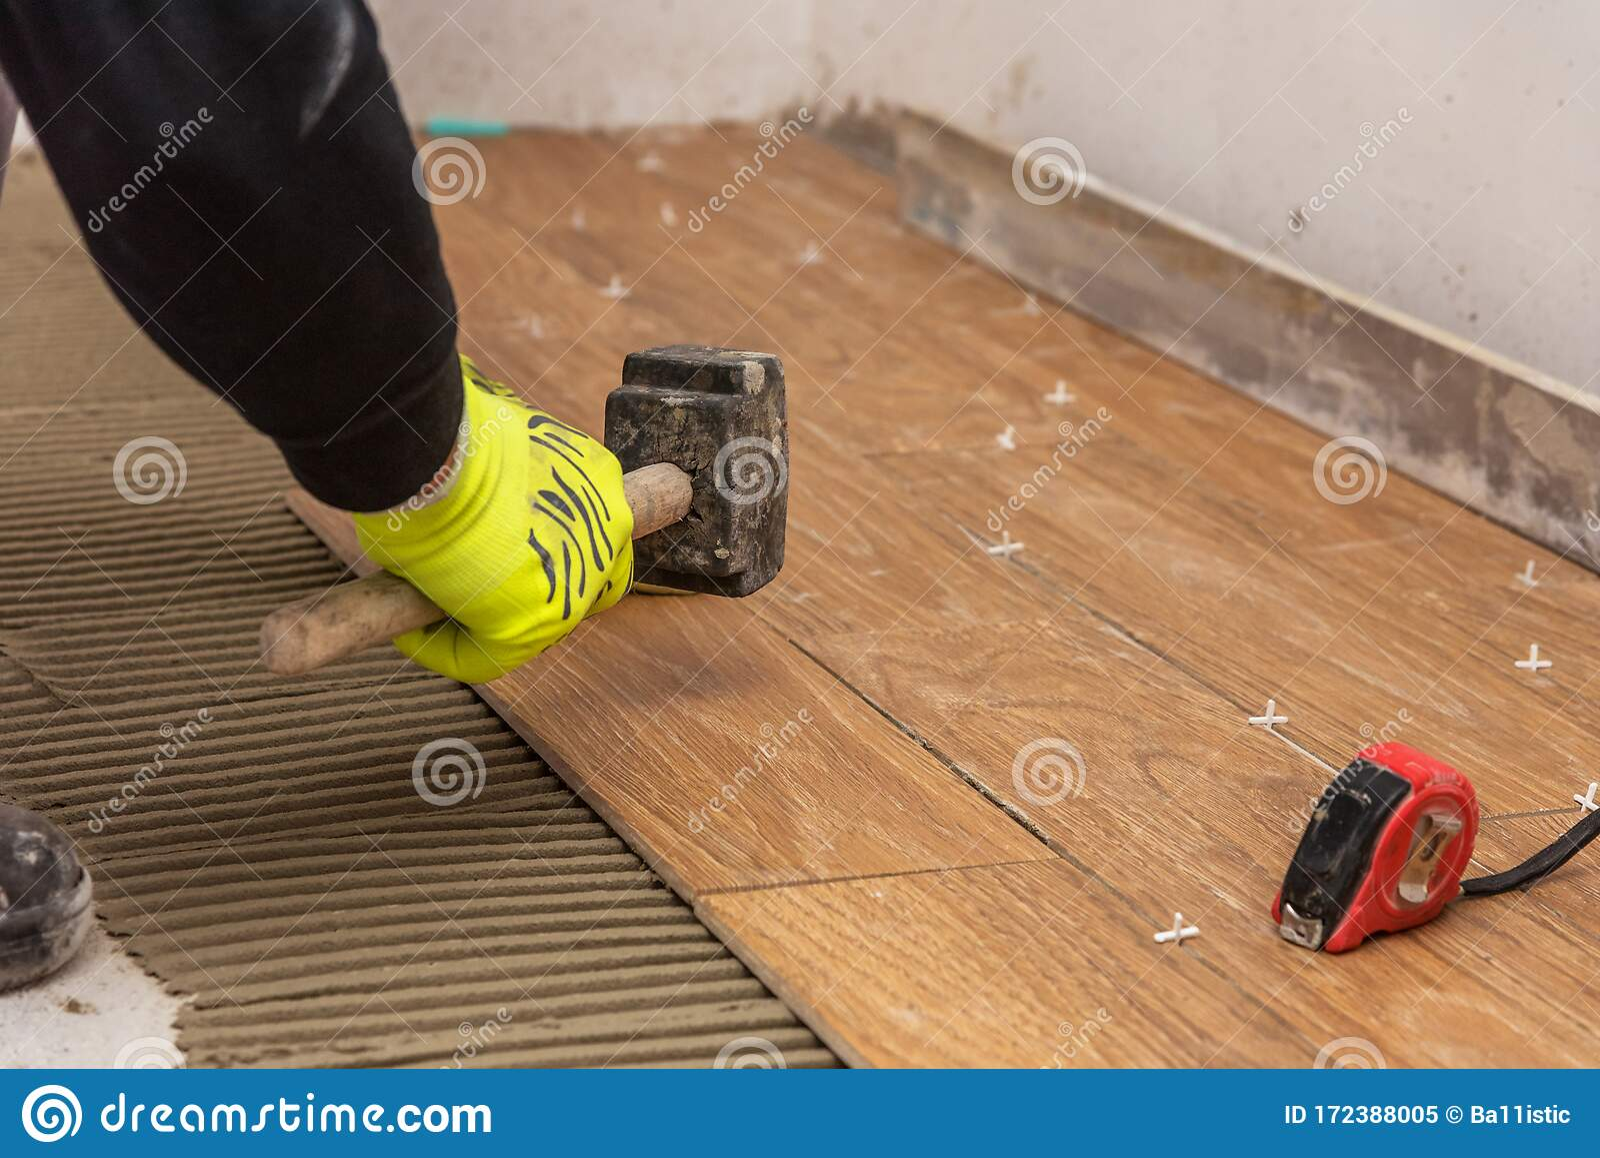 https www dreamstime com worker placing ceramic floor tiles adhesive surface leveling rubber hammer tools tiler installation home image172388005